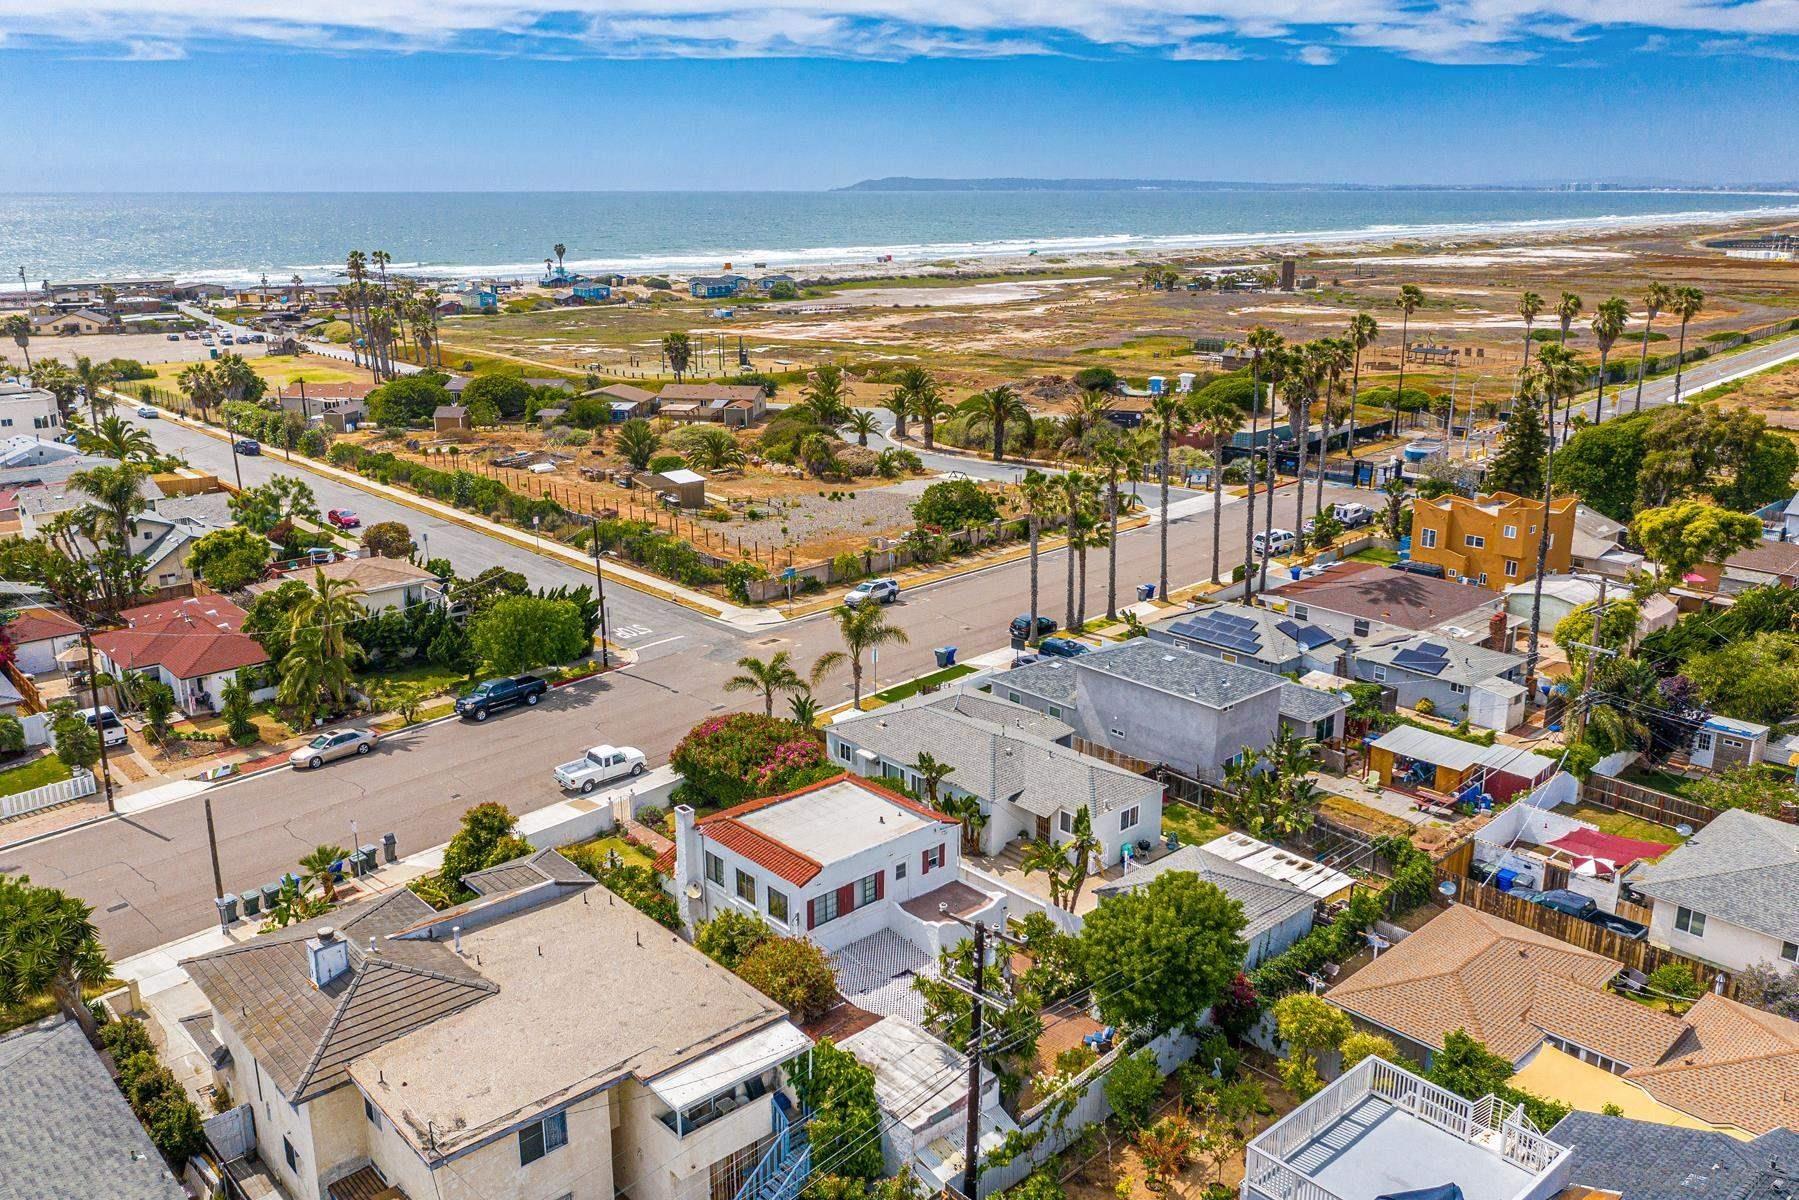 Photo of 611 Silver Strand Blvd, Imperial Beach, CA 91932 (MLS # 210016254)